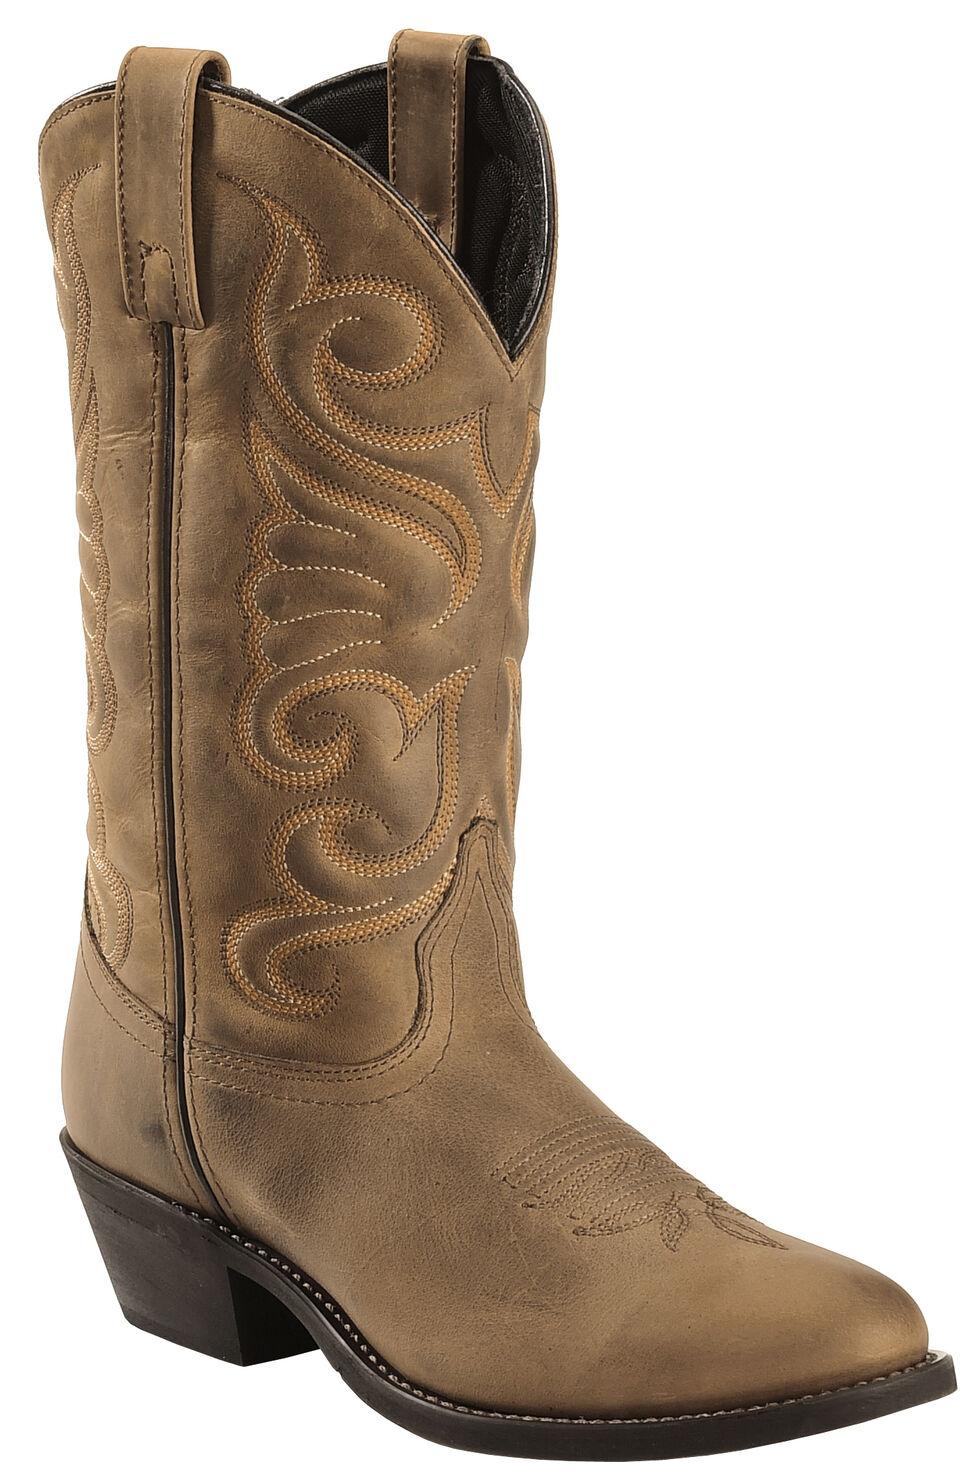 Laredo Bridget Cowgirl Boots - Round Toe, Tan, hi-res